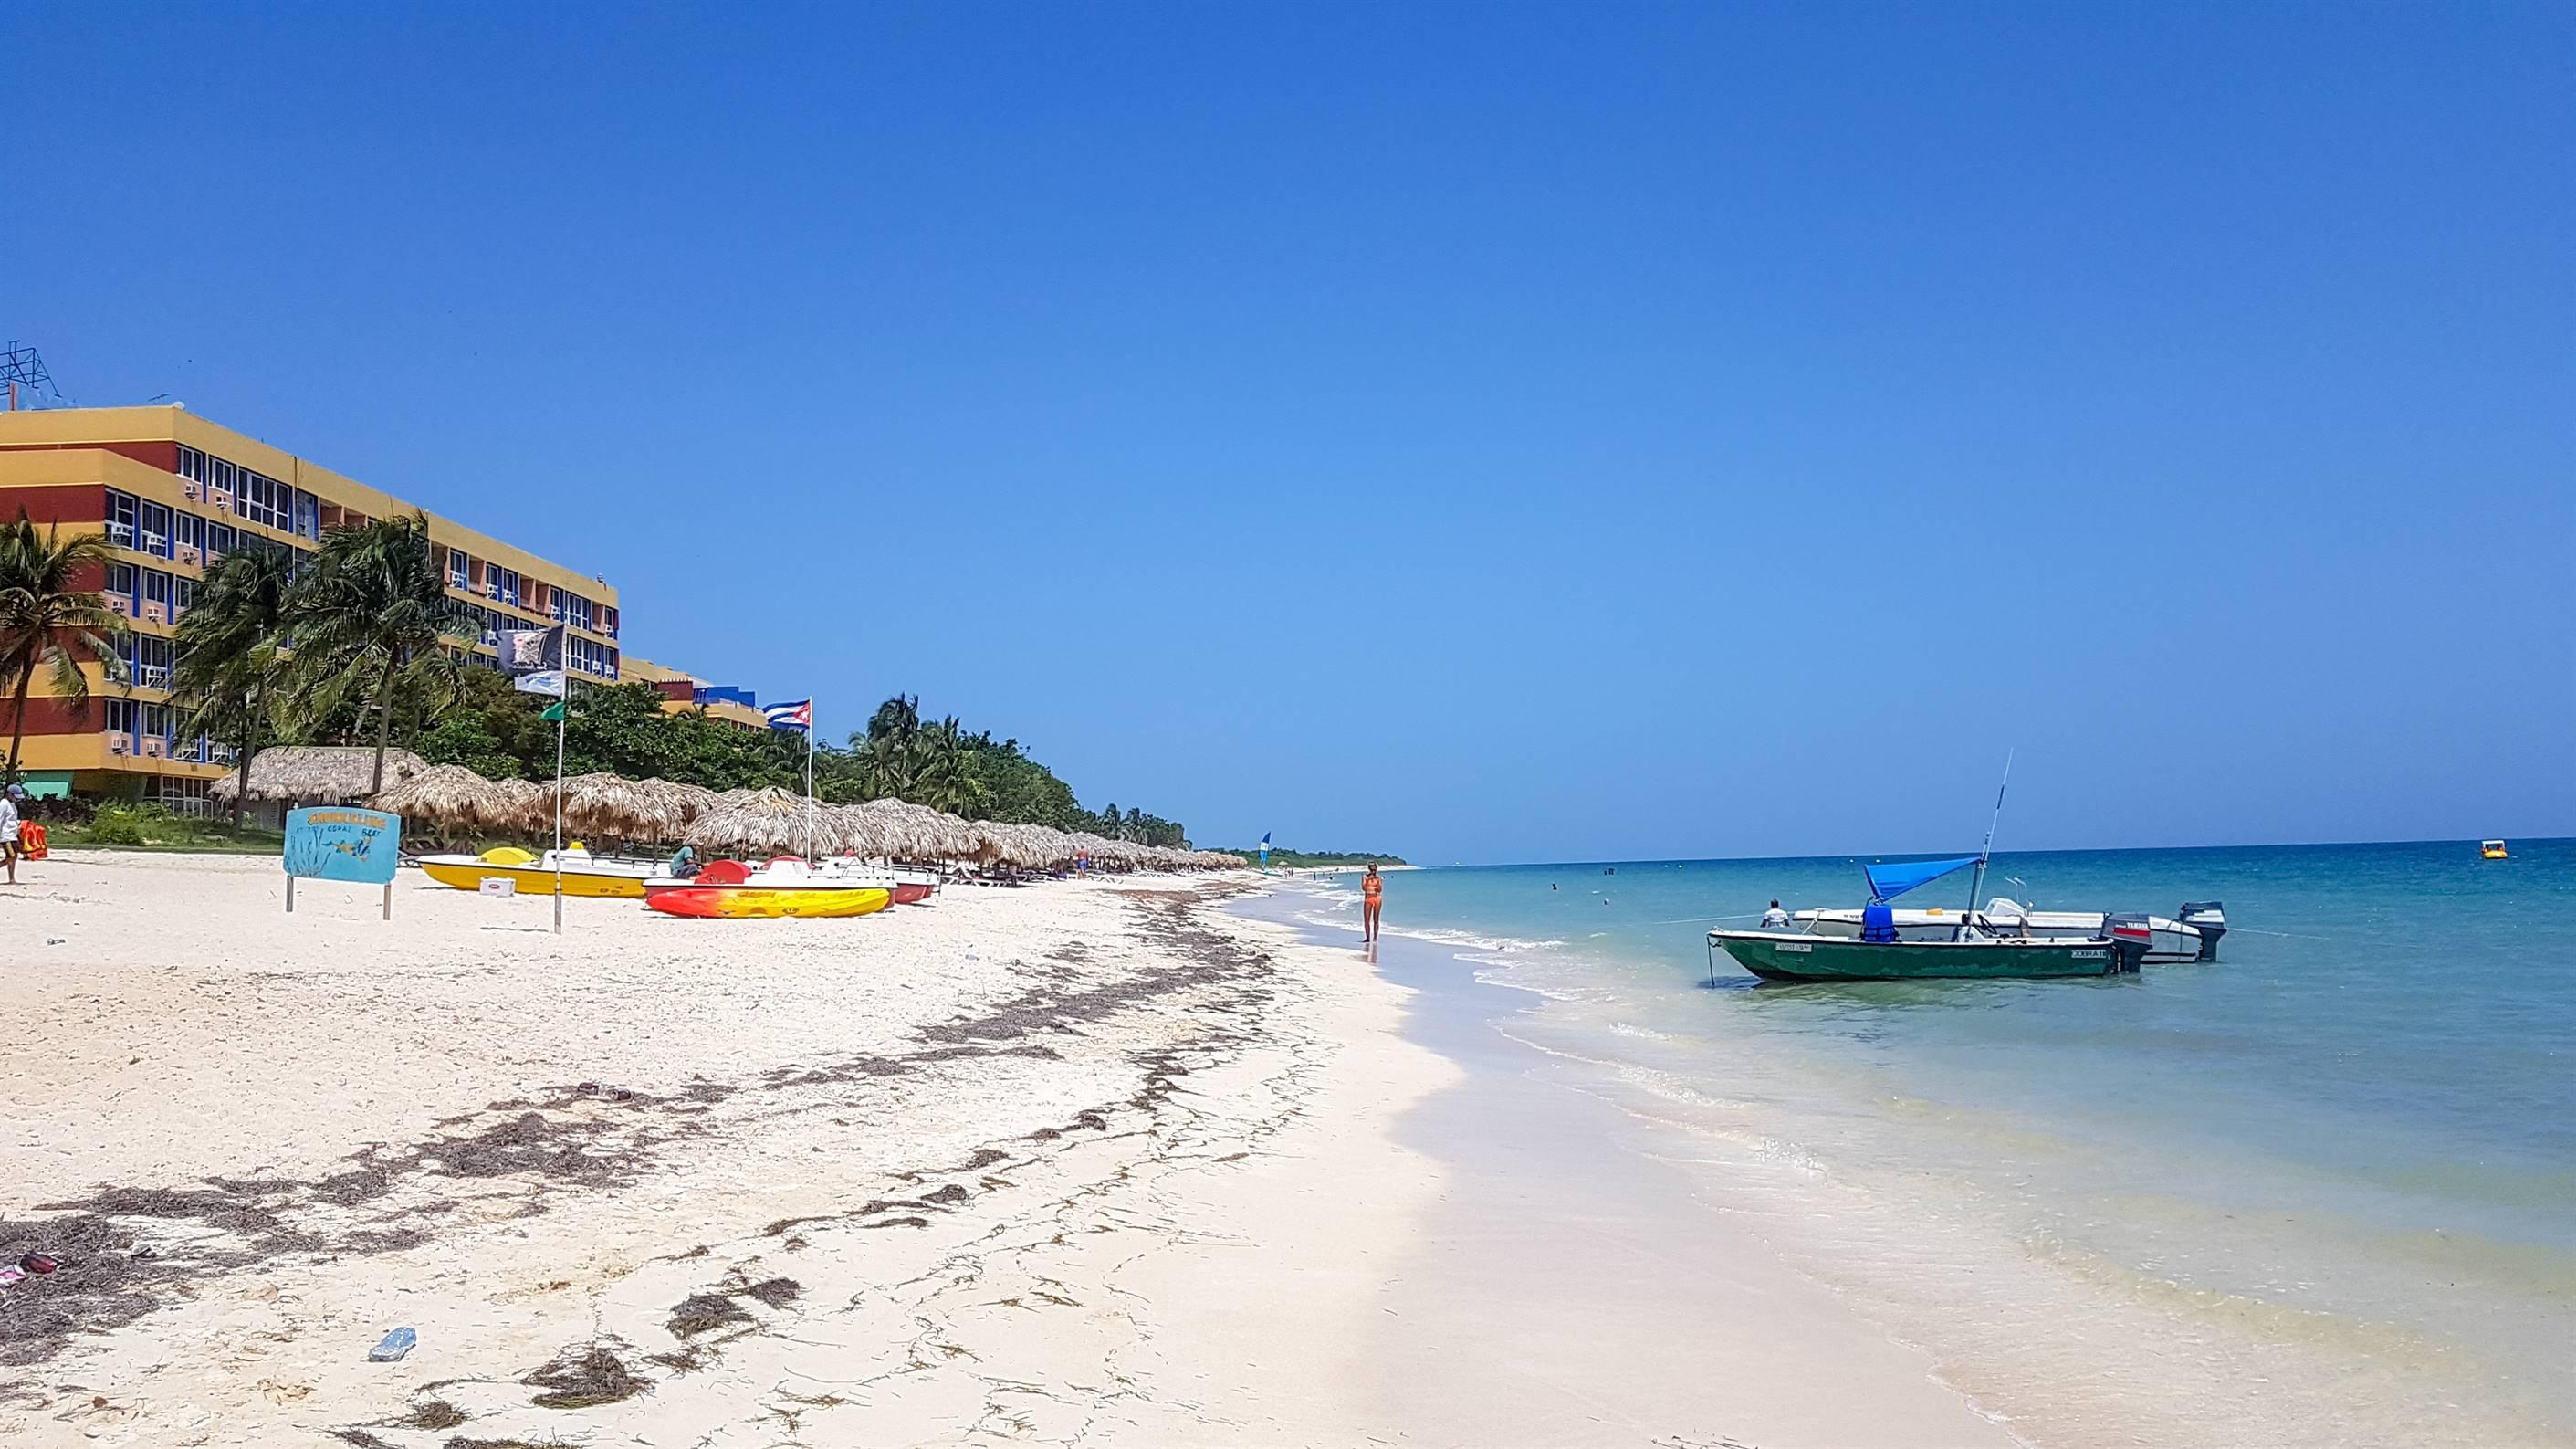 Playa Ancon - Trinidad - CUBA